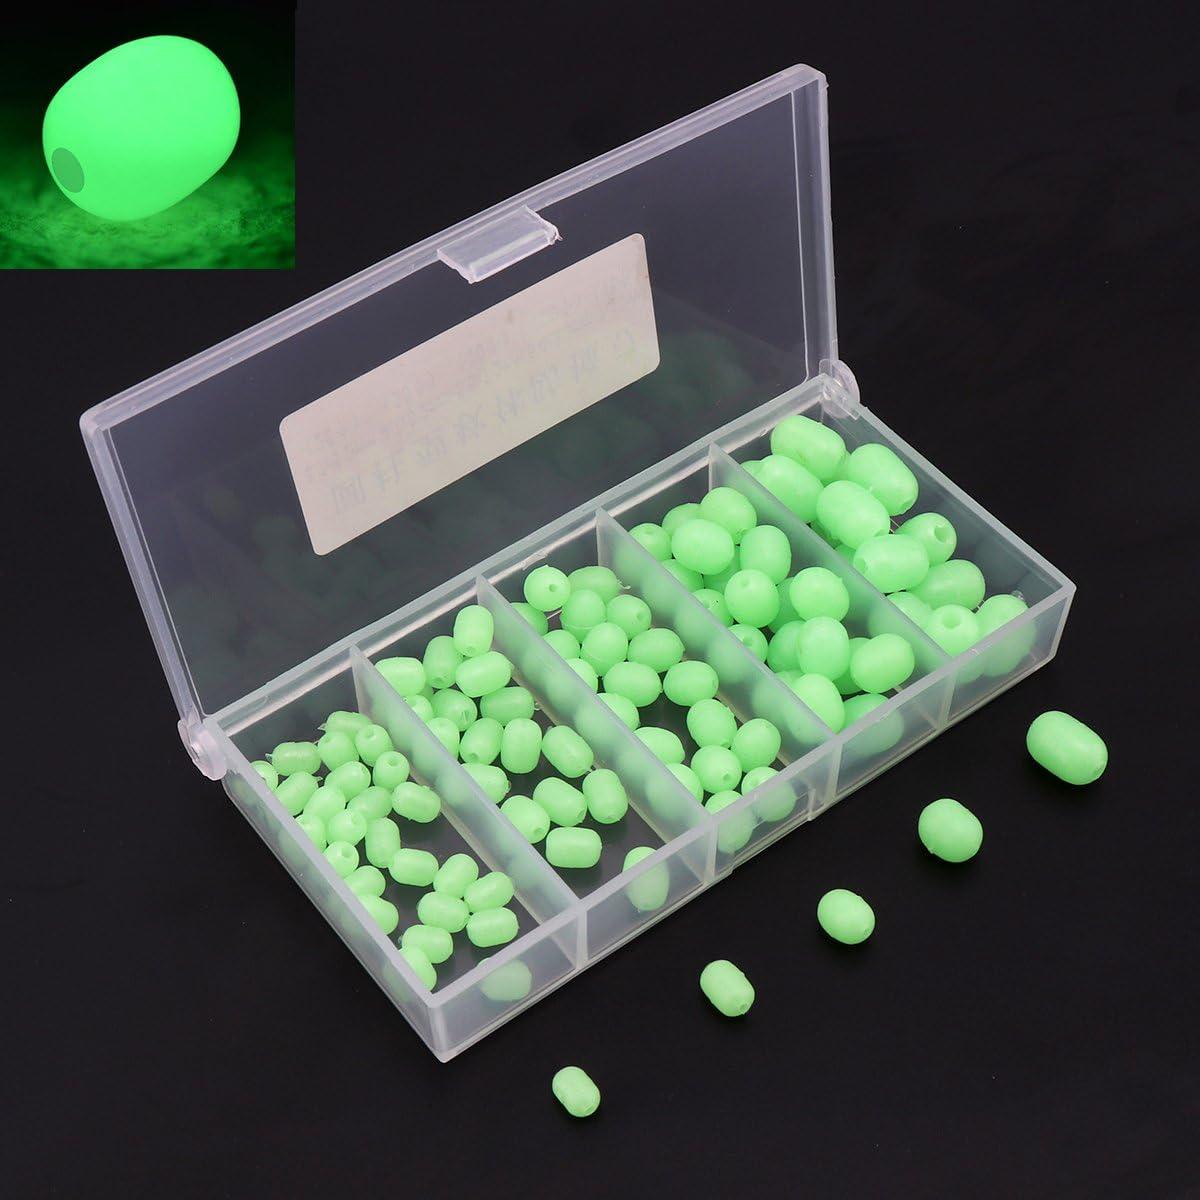 100pcs 3.4 x 5mm Soft Plastic Luminous Glow Fishing Beads Sea Fishing Lure Float